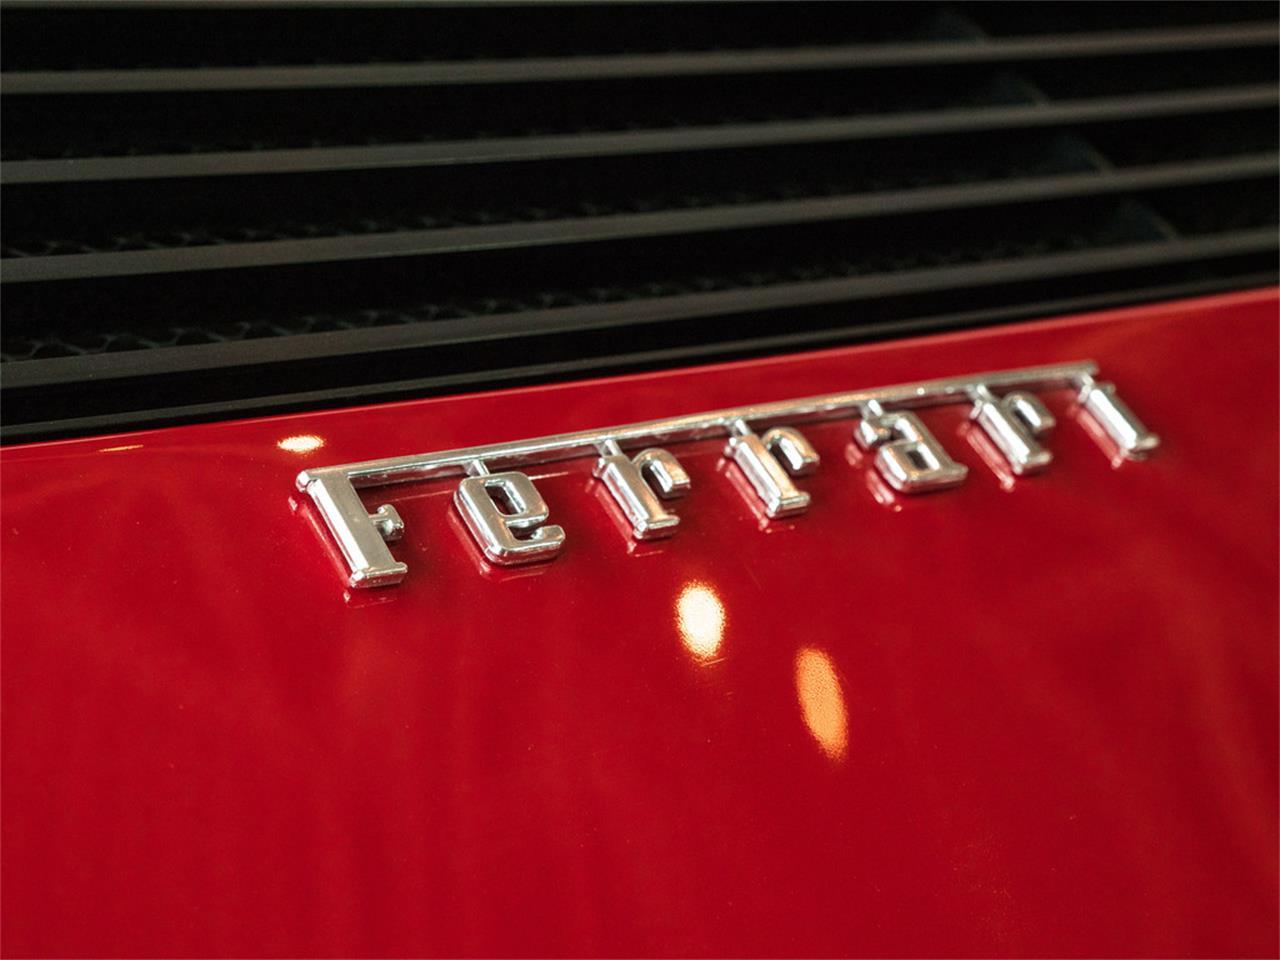 1990 Ferrari Testarossa (CC-1235311) for sale in Kelowna, British Columbia